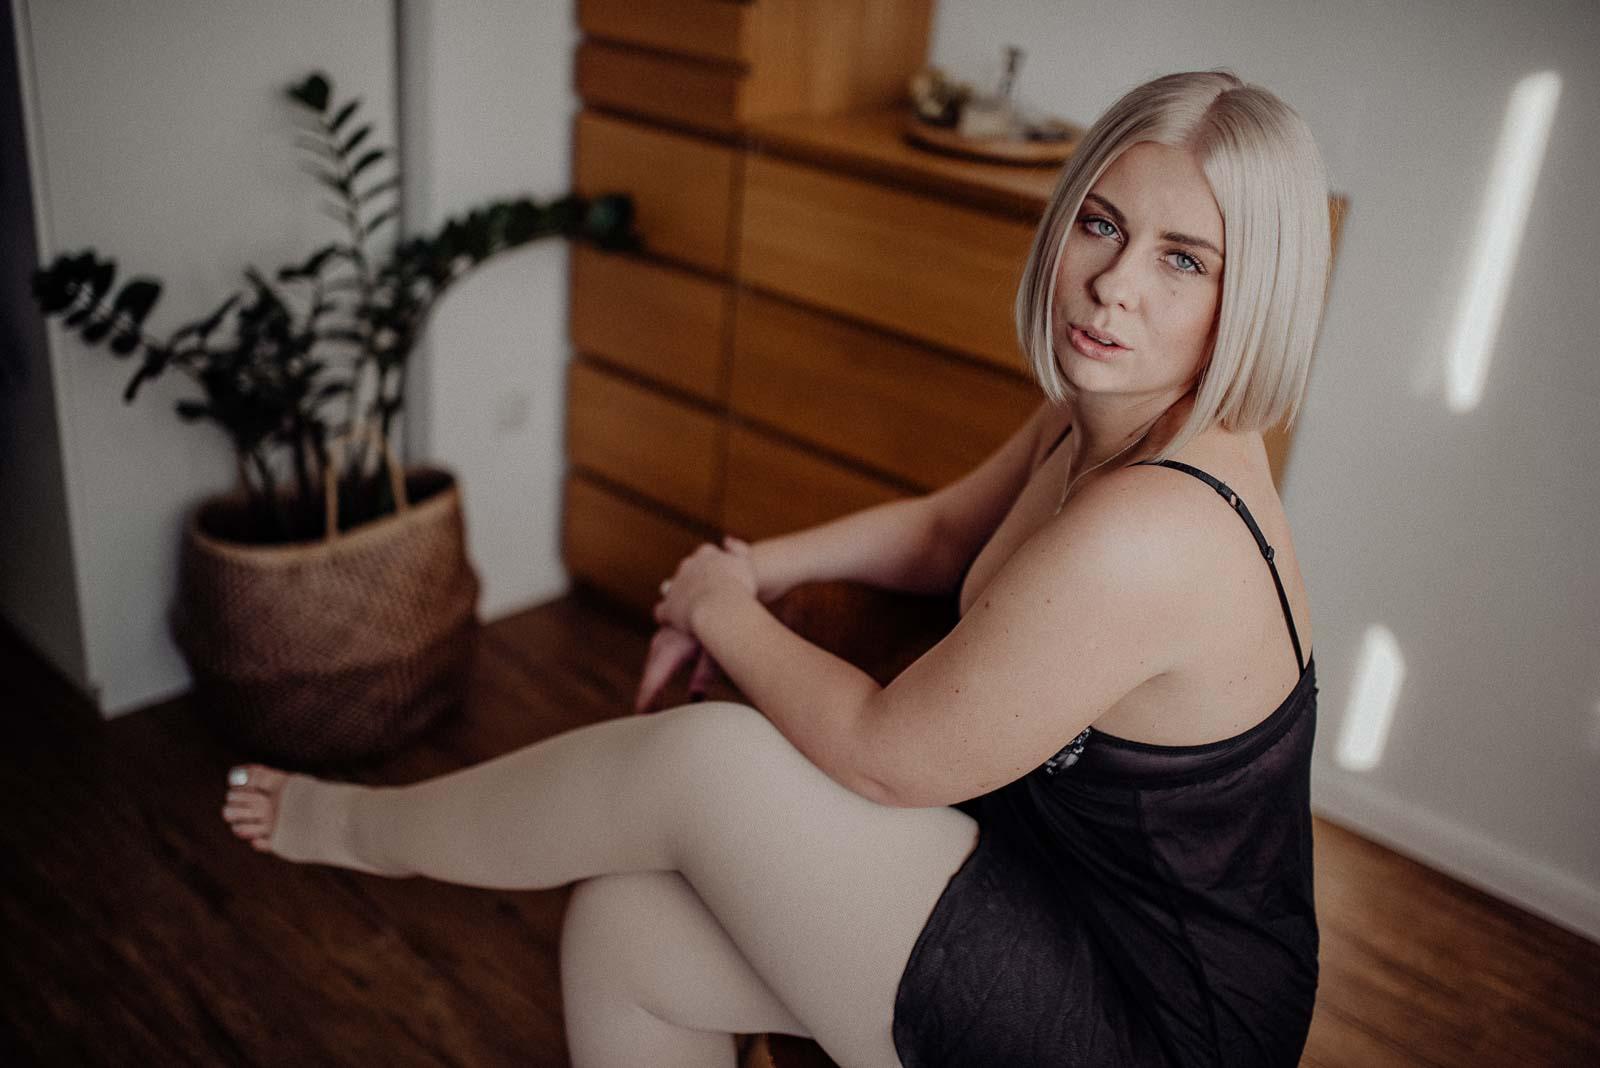 027-fotoshooting boudoir mit lipoedem als homeshooting_